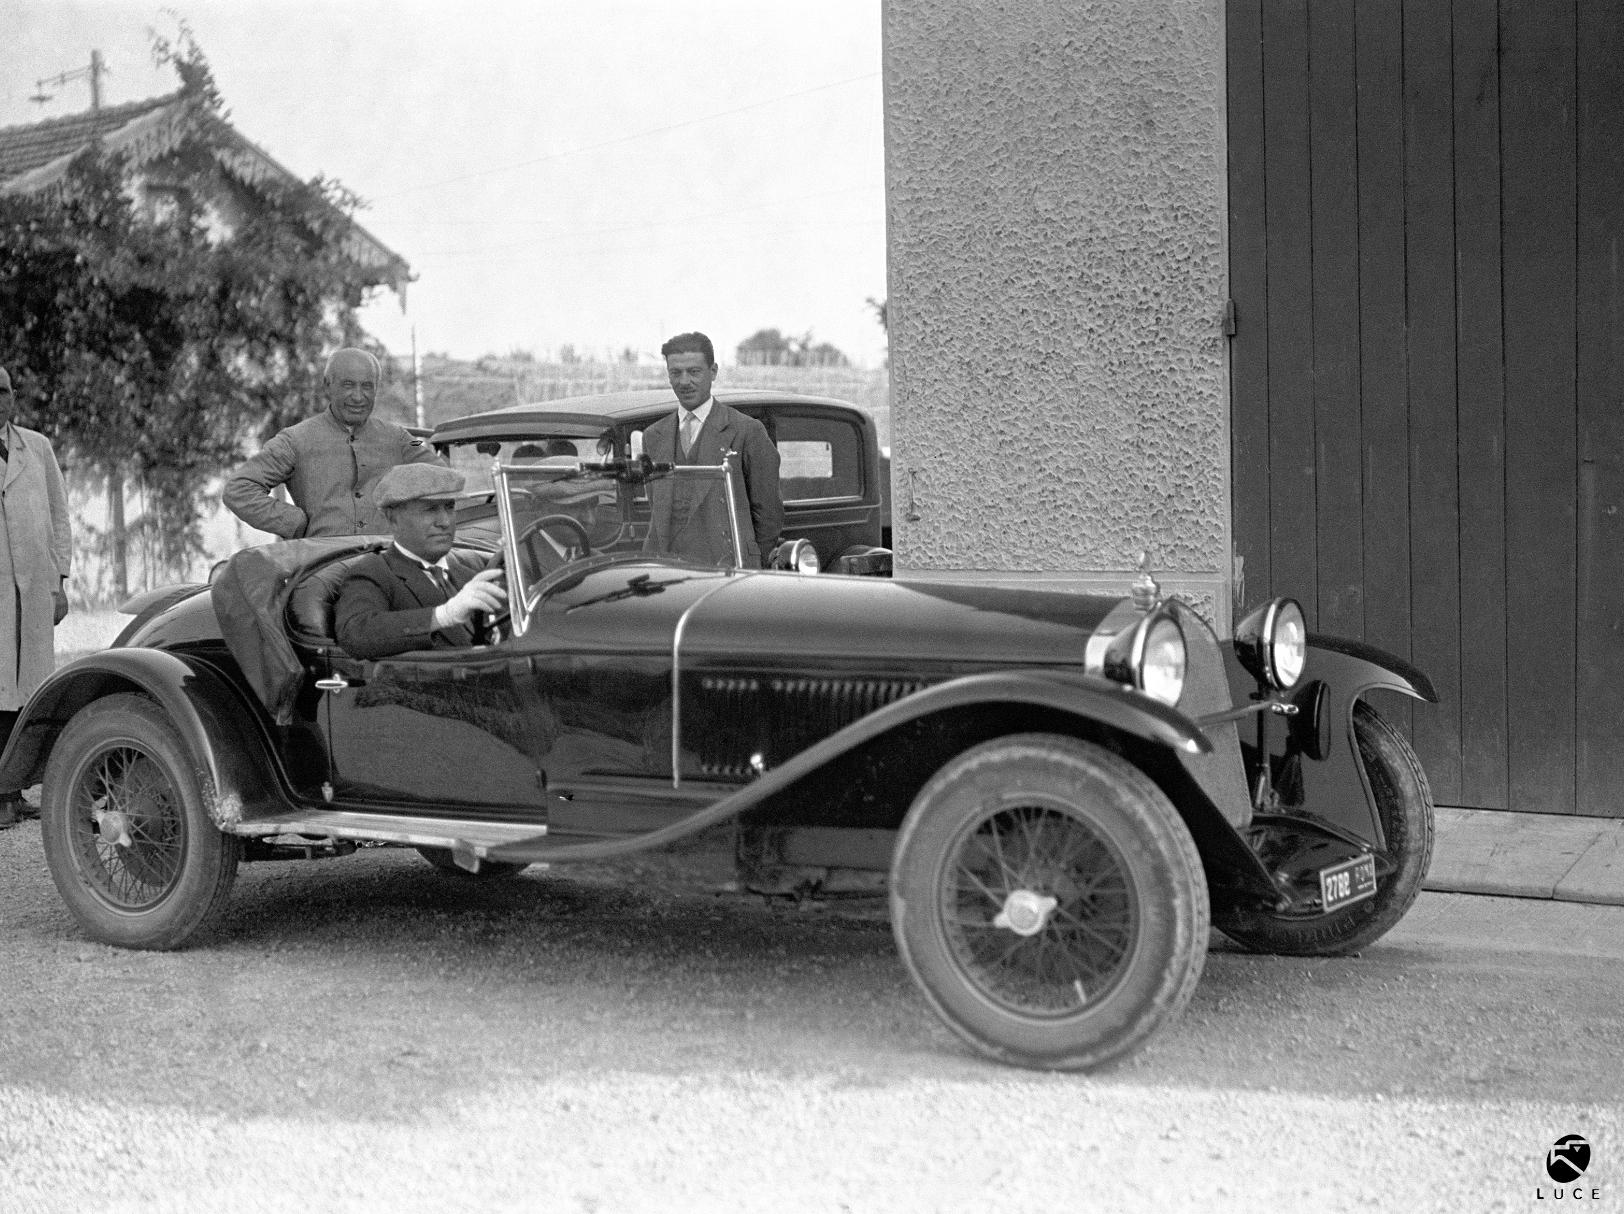 Mussolini 1930 Alfa Romeo 6C 1750 SS black and white